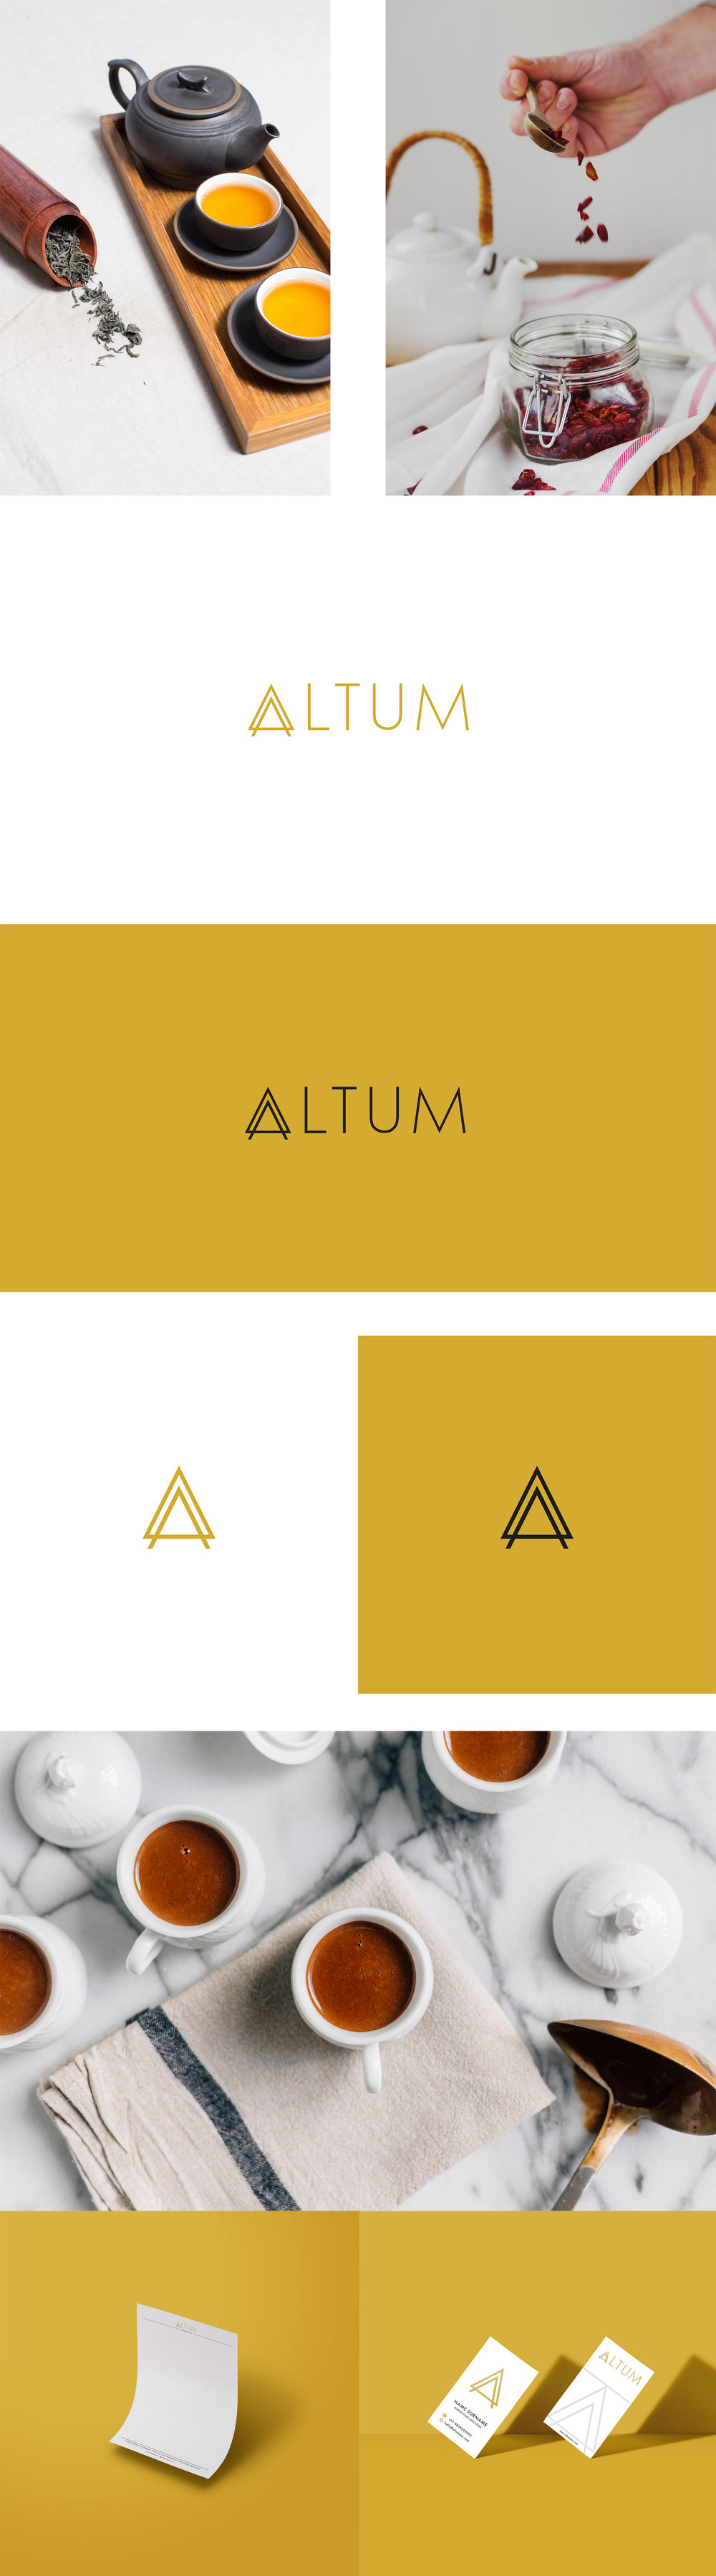 Altum-(1).jpg